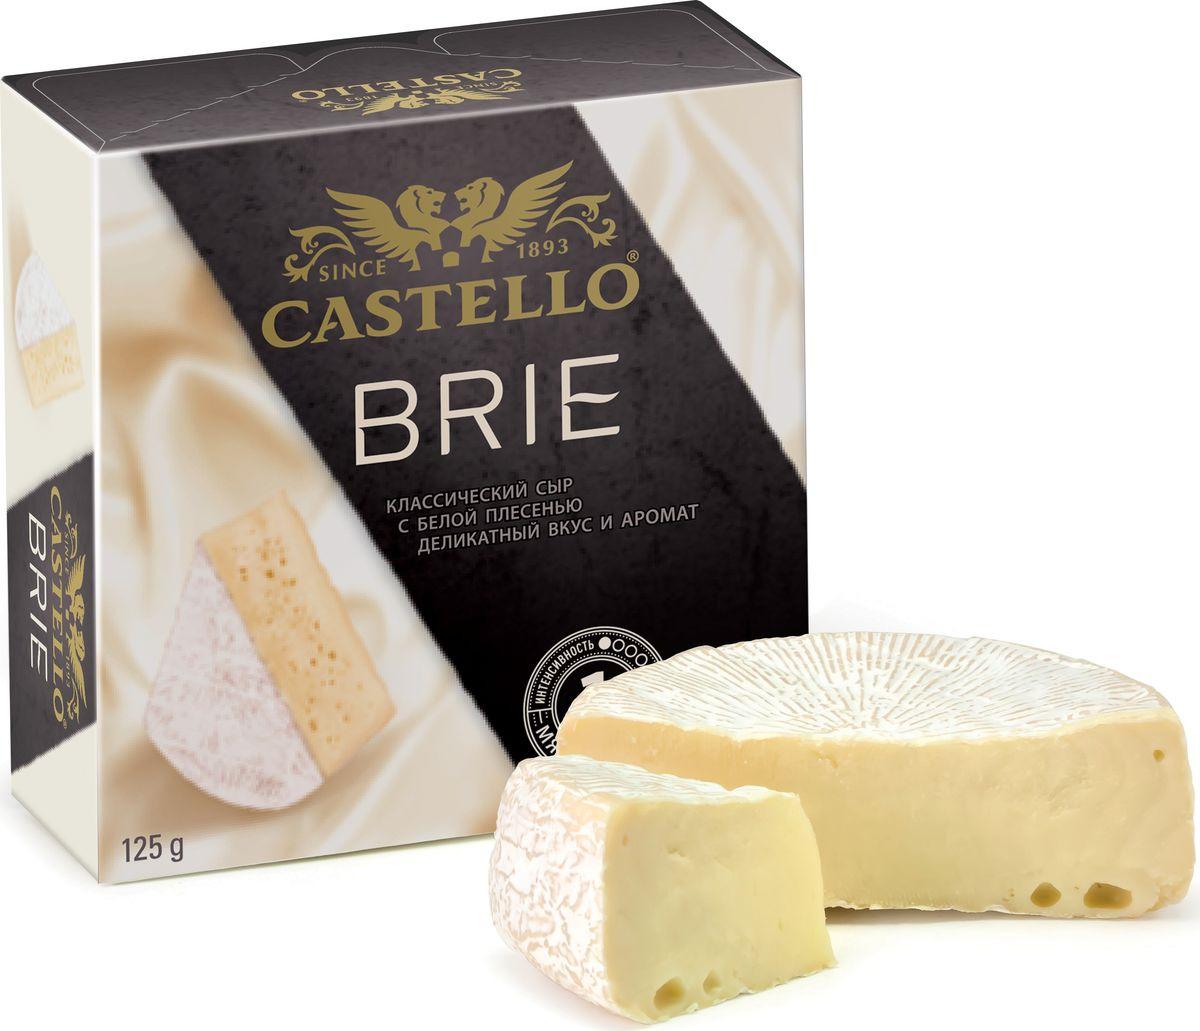 Сыр с белой плесенью Castello Brie, 125 г цена 2017